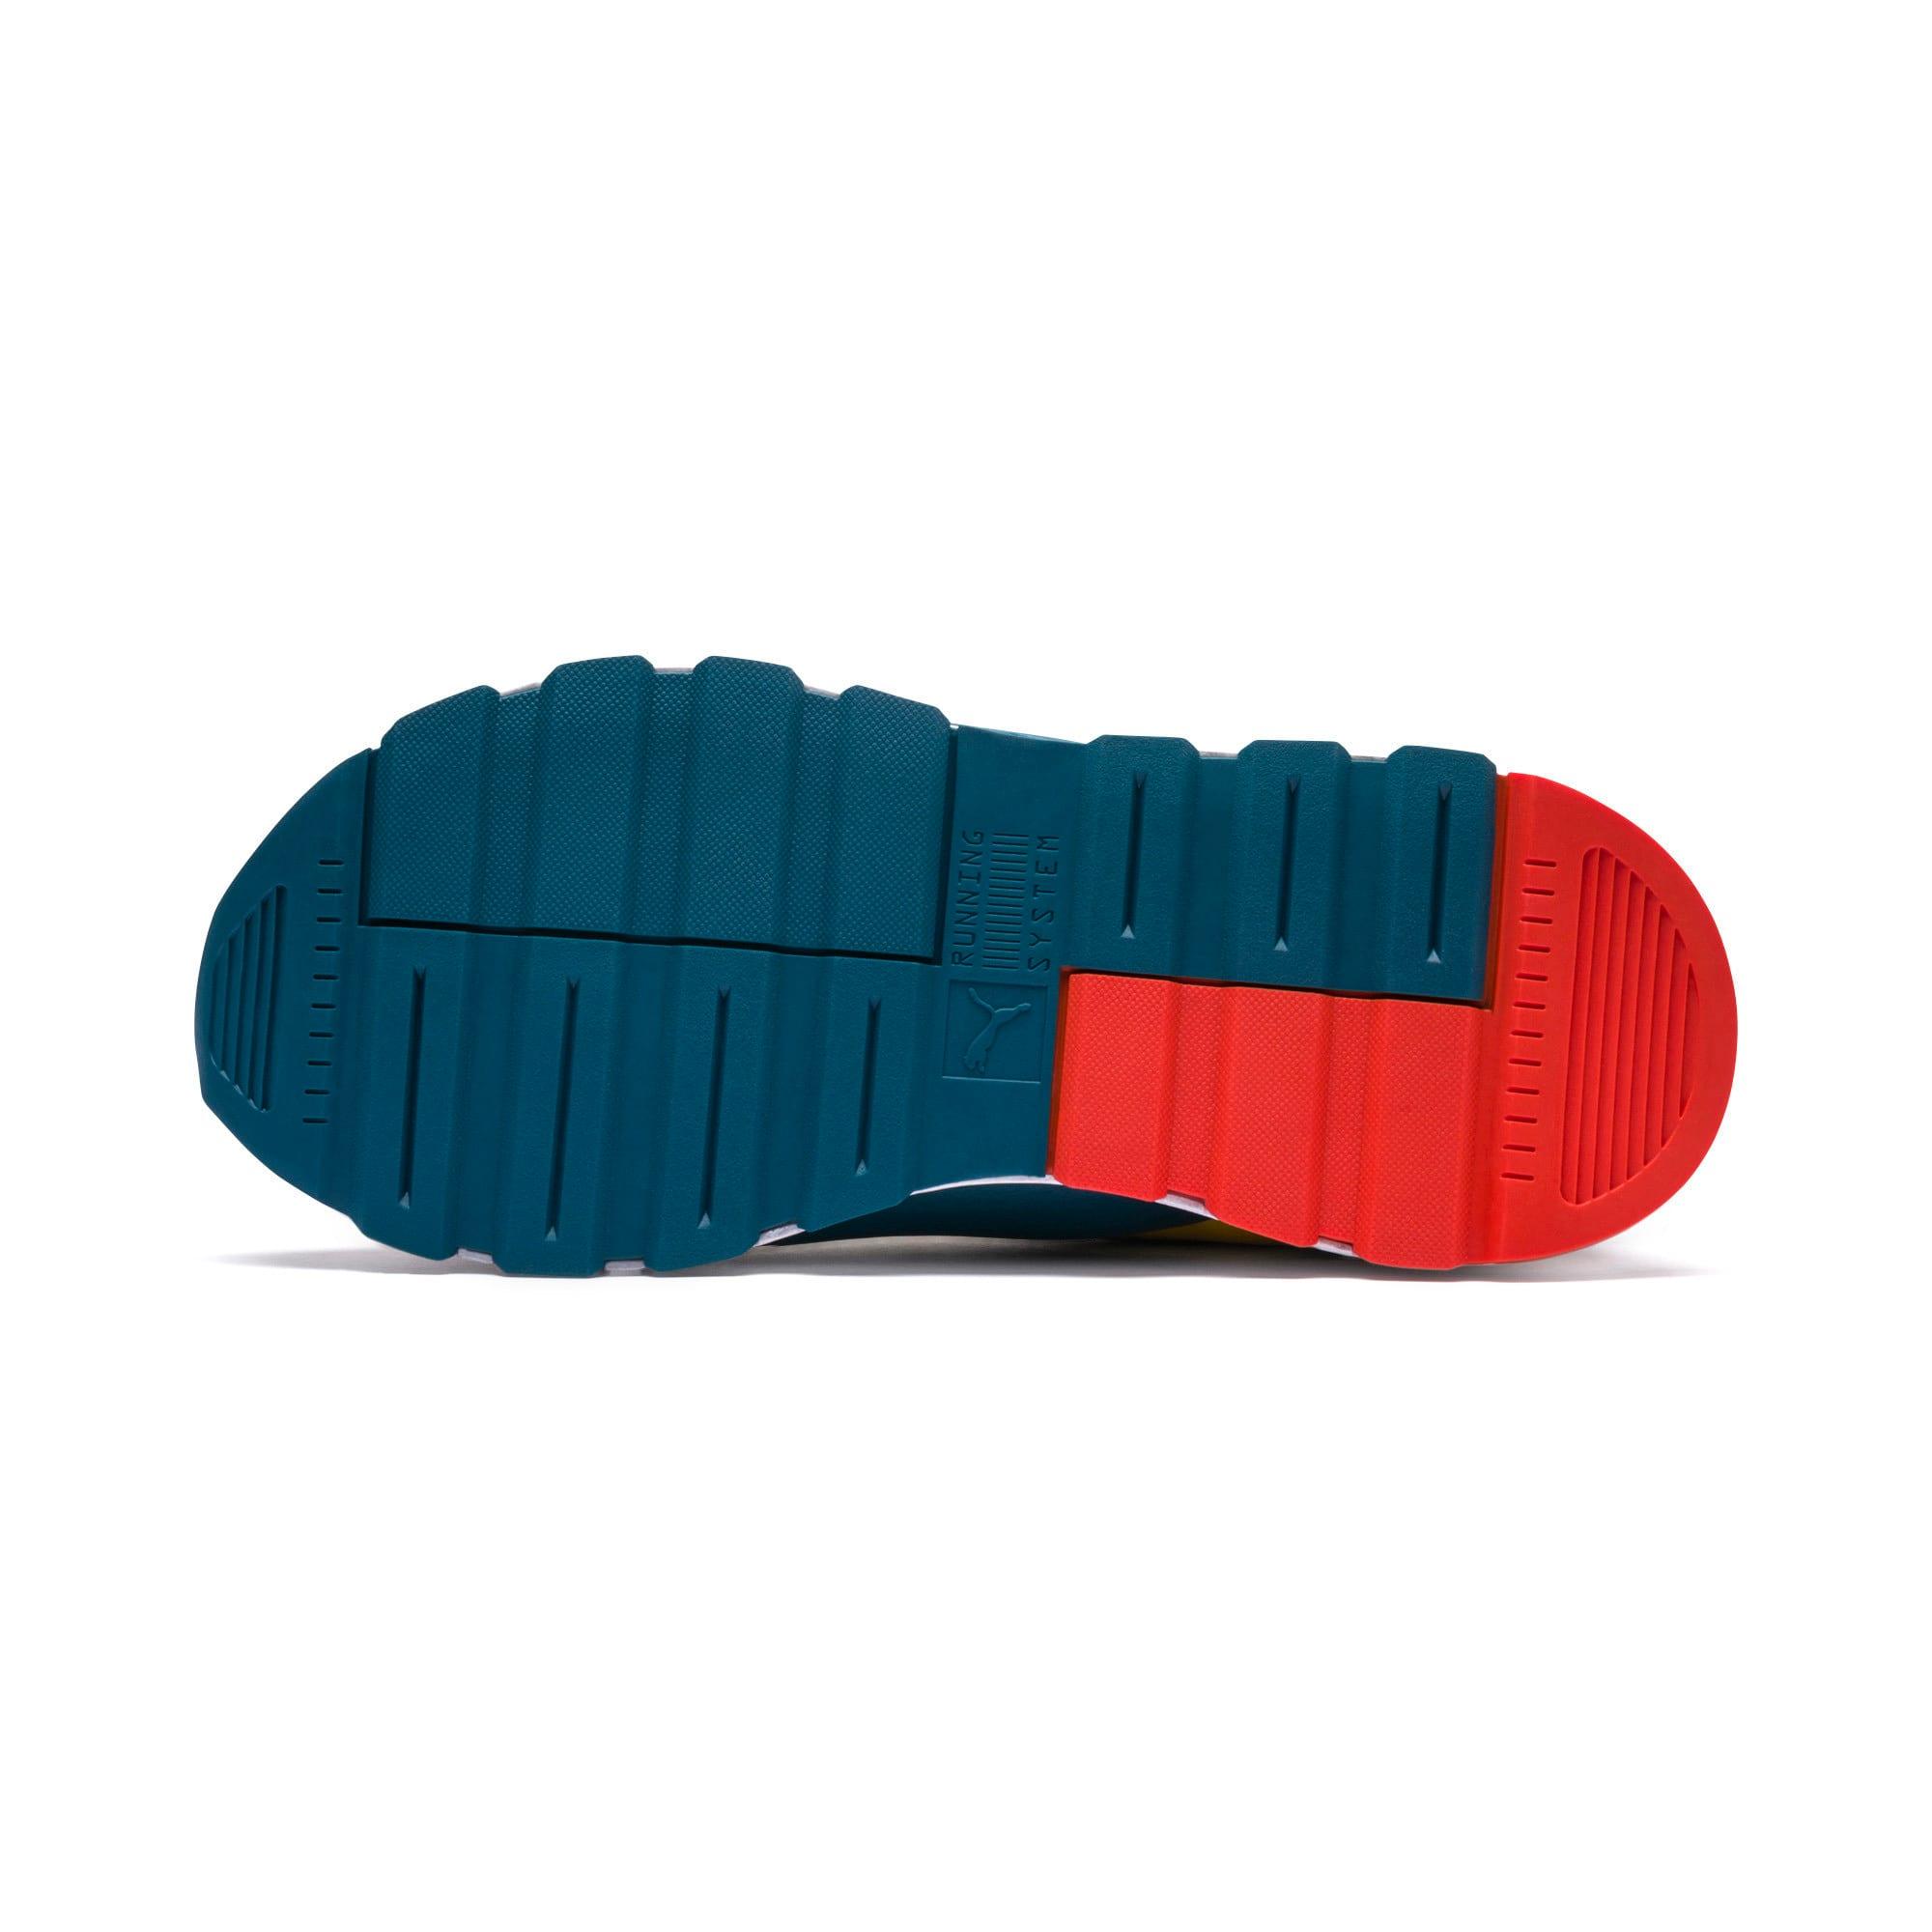 Thumbnail 4 of Sesame Street 50 RS-0 Sneakers JR, Rose-Blue Coral-Dandelion, medium